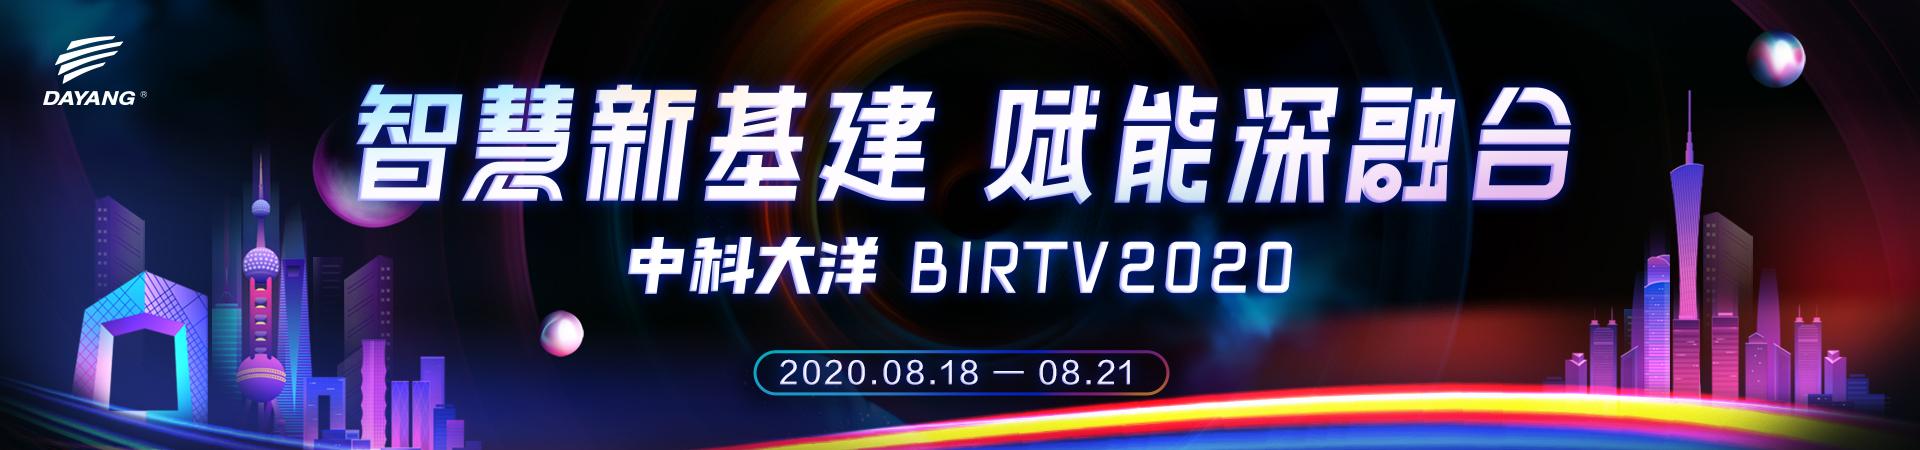 BIRTV2020 C位出道笑眯,high翻全炒炭图肌!中科大洋的这场直播必须上头条!